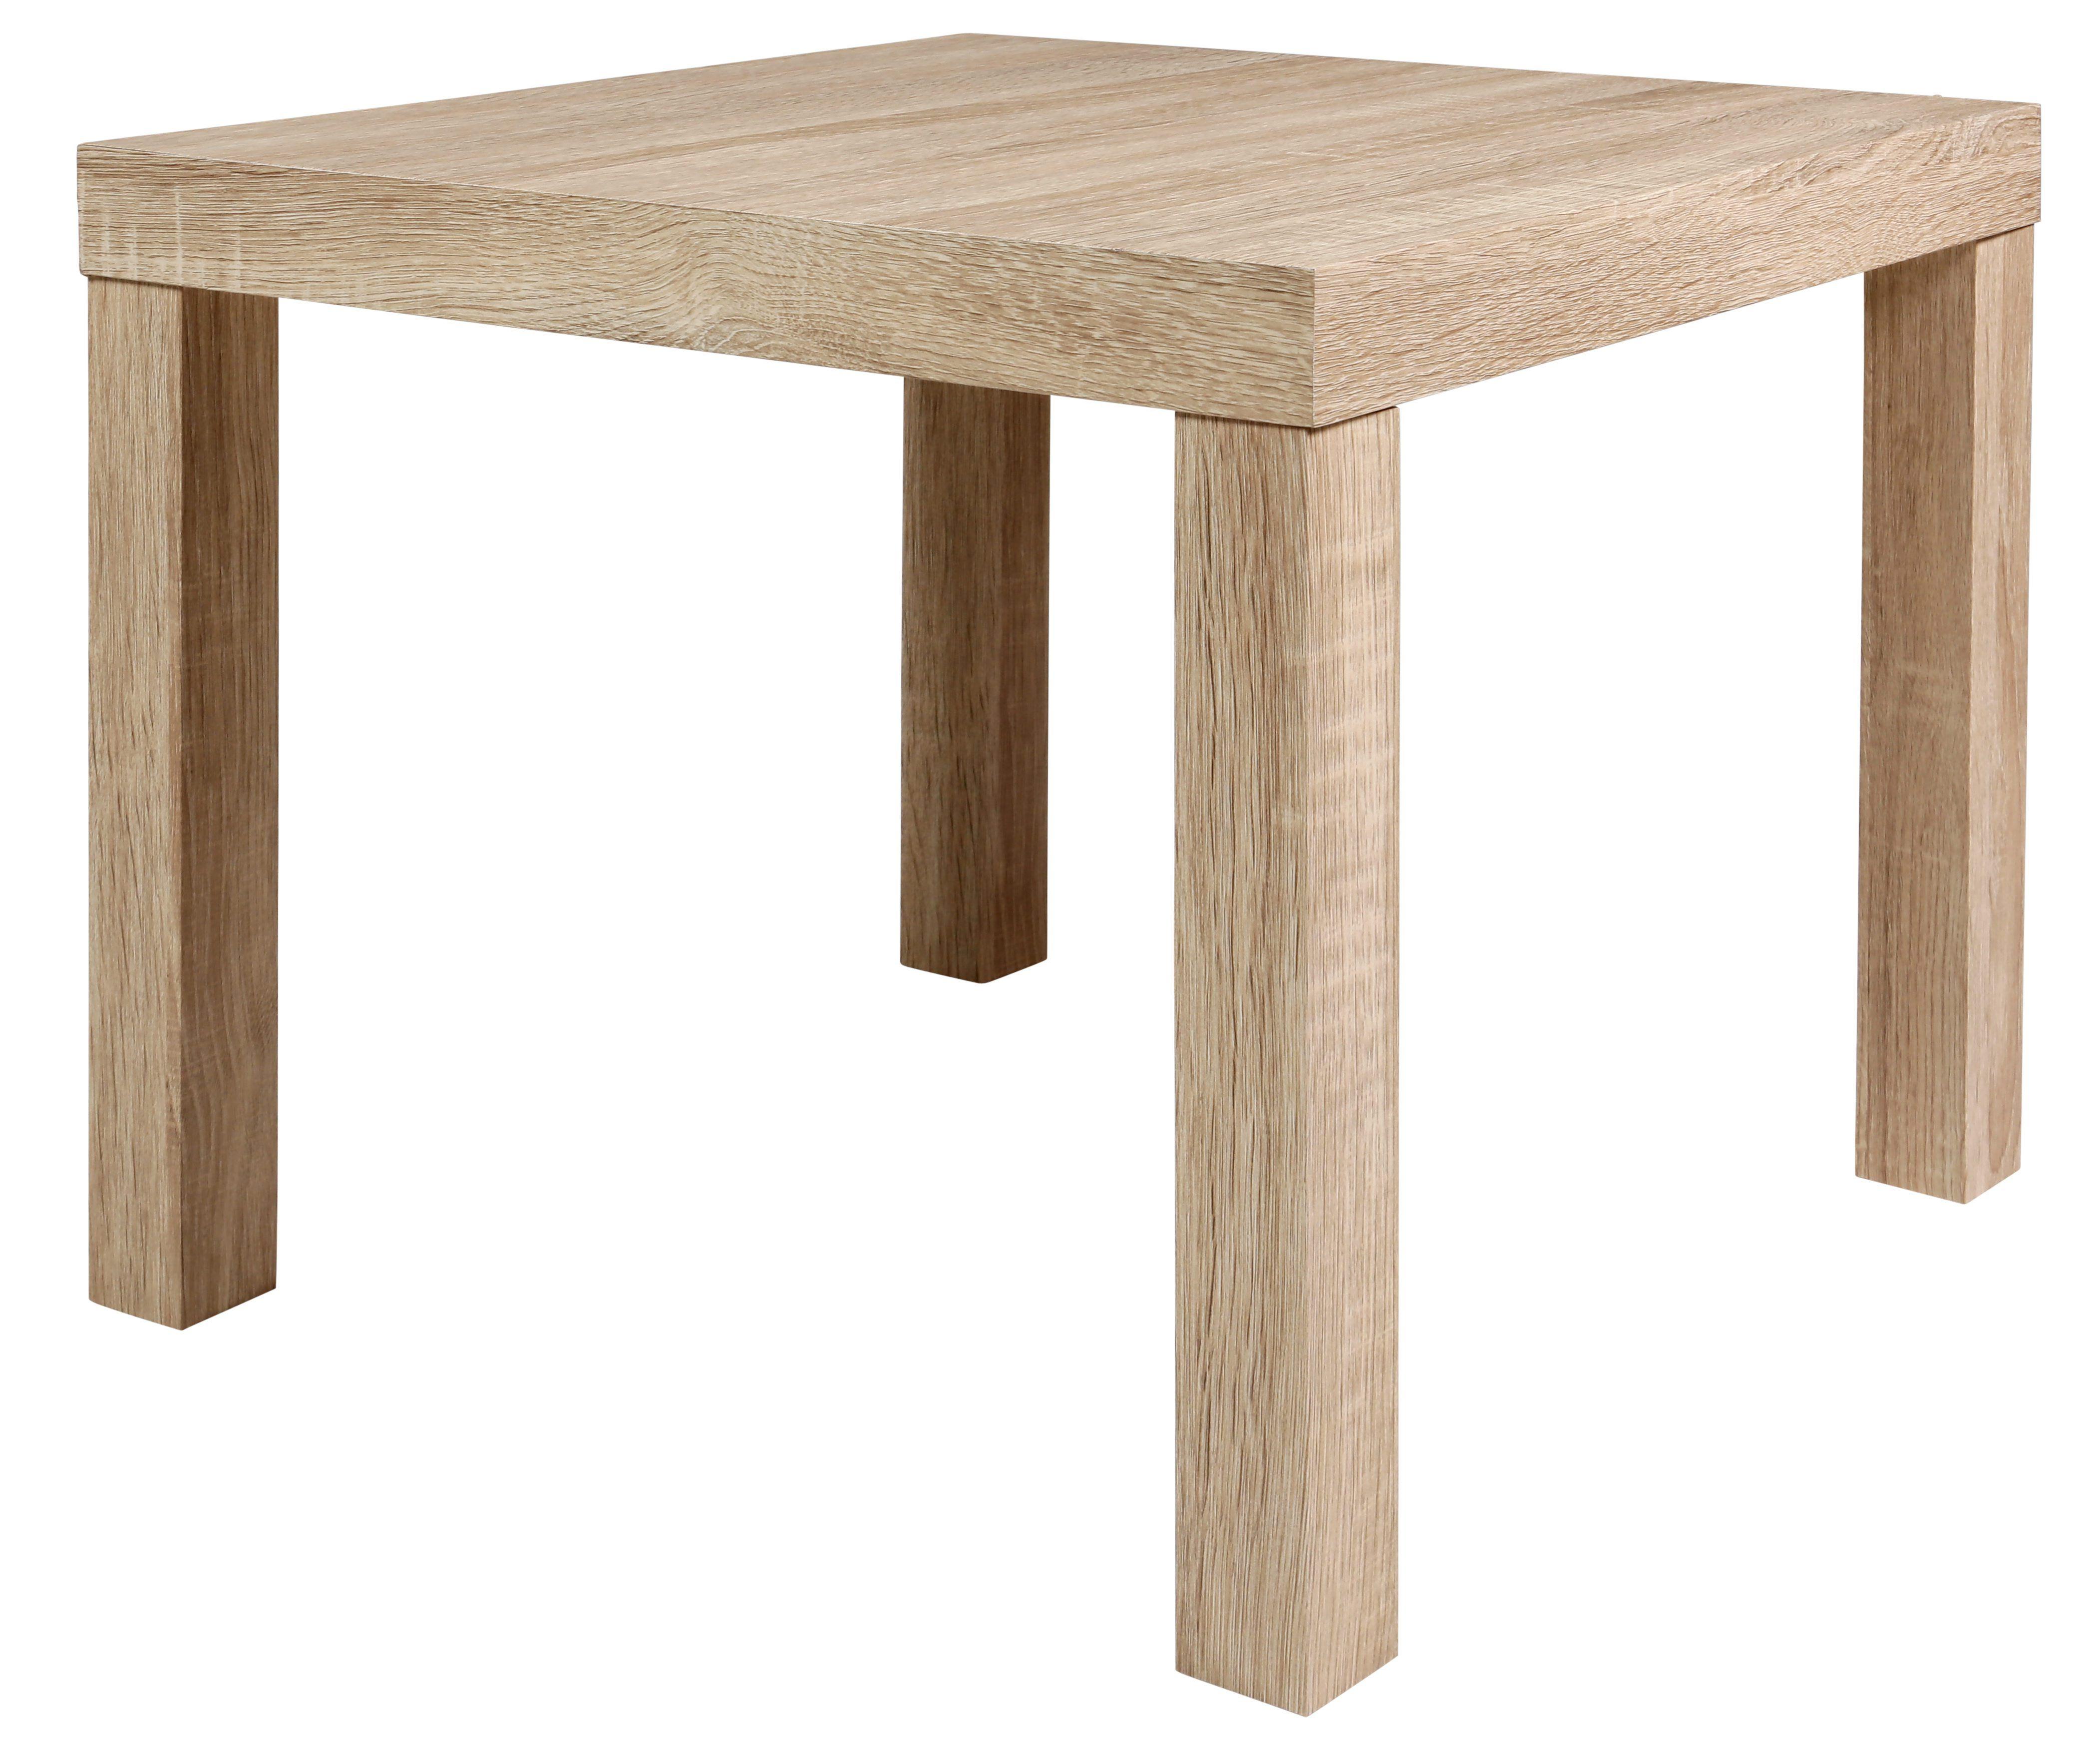 table basse carrée next 2 chêne sonoma